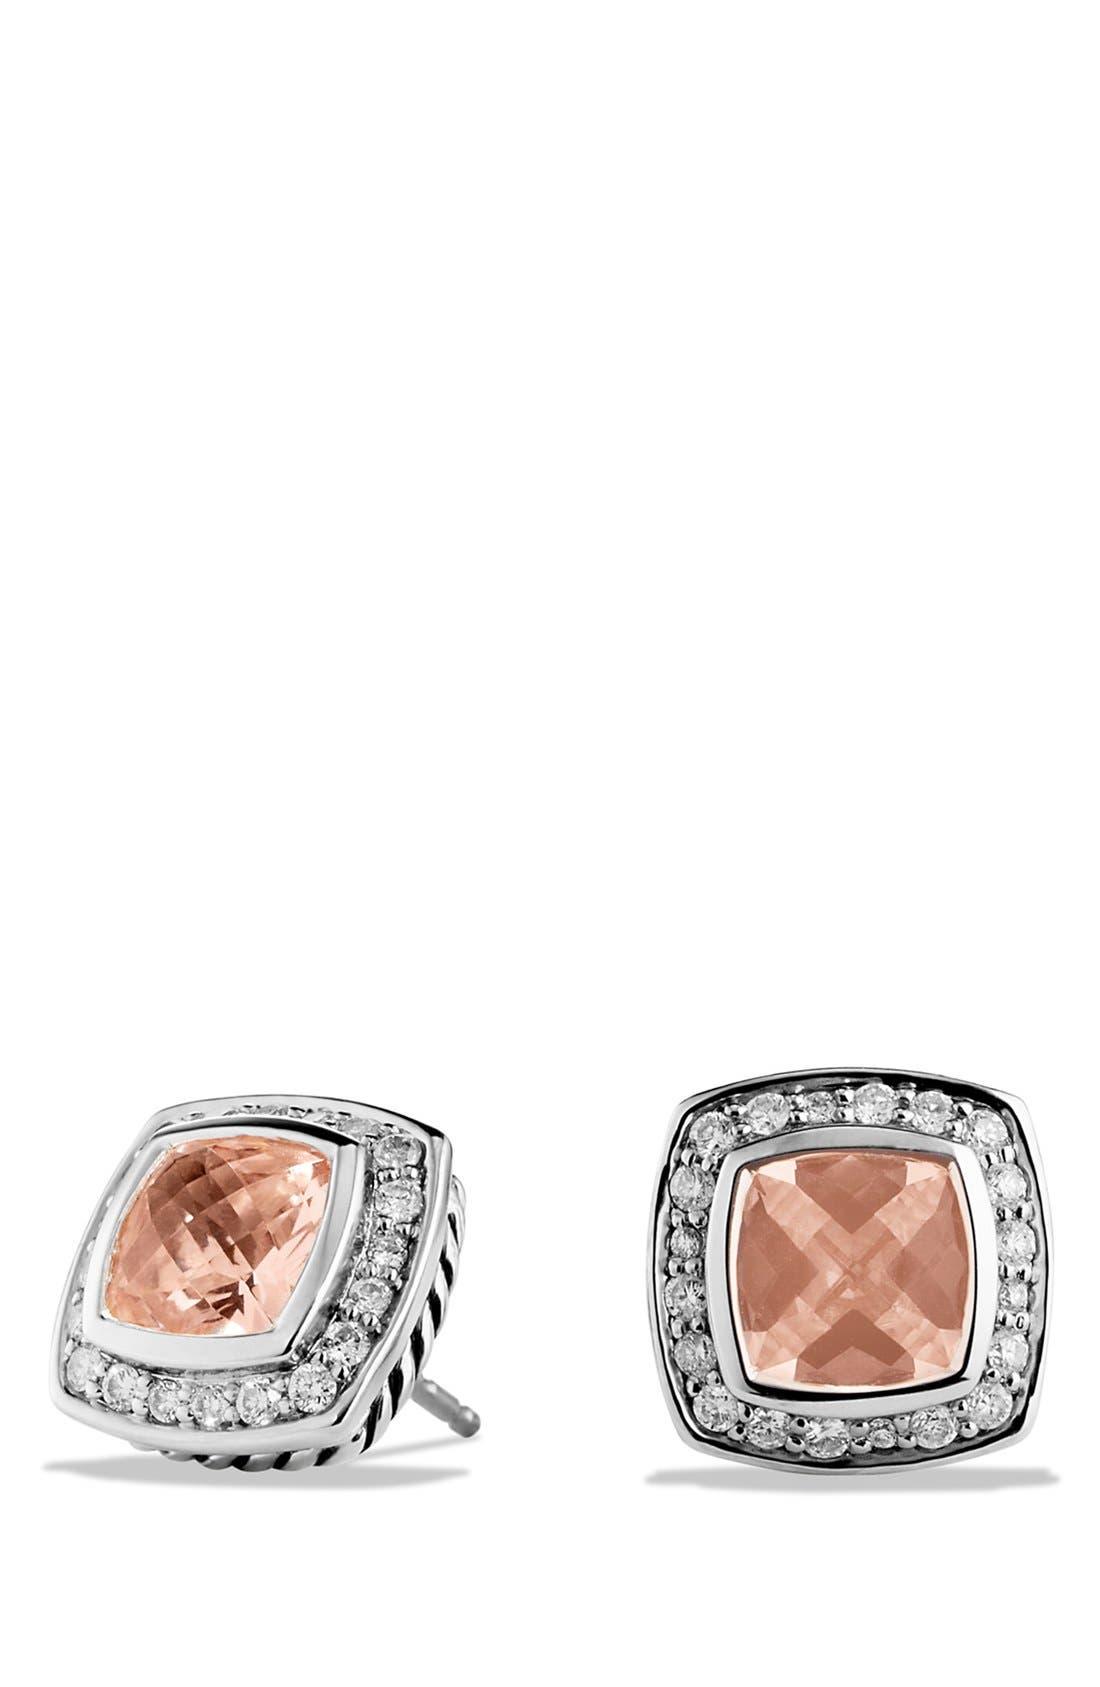 'Albion' Petite Earrings with Semiprecious Stones & Diamonds,                             Main thumbnail 7, color,